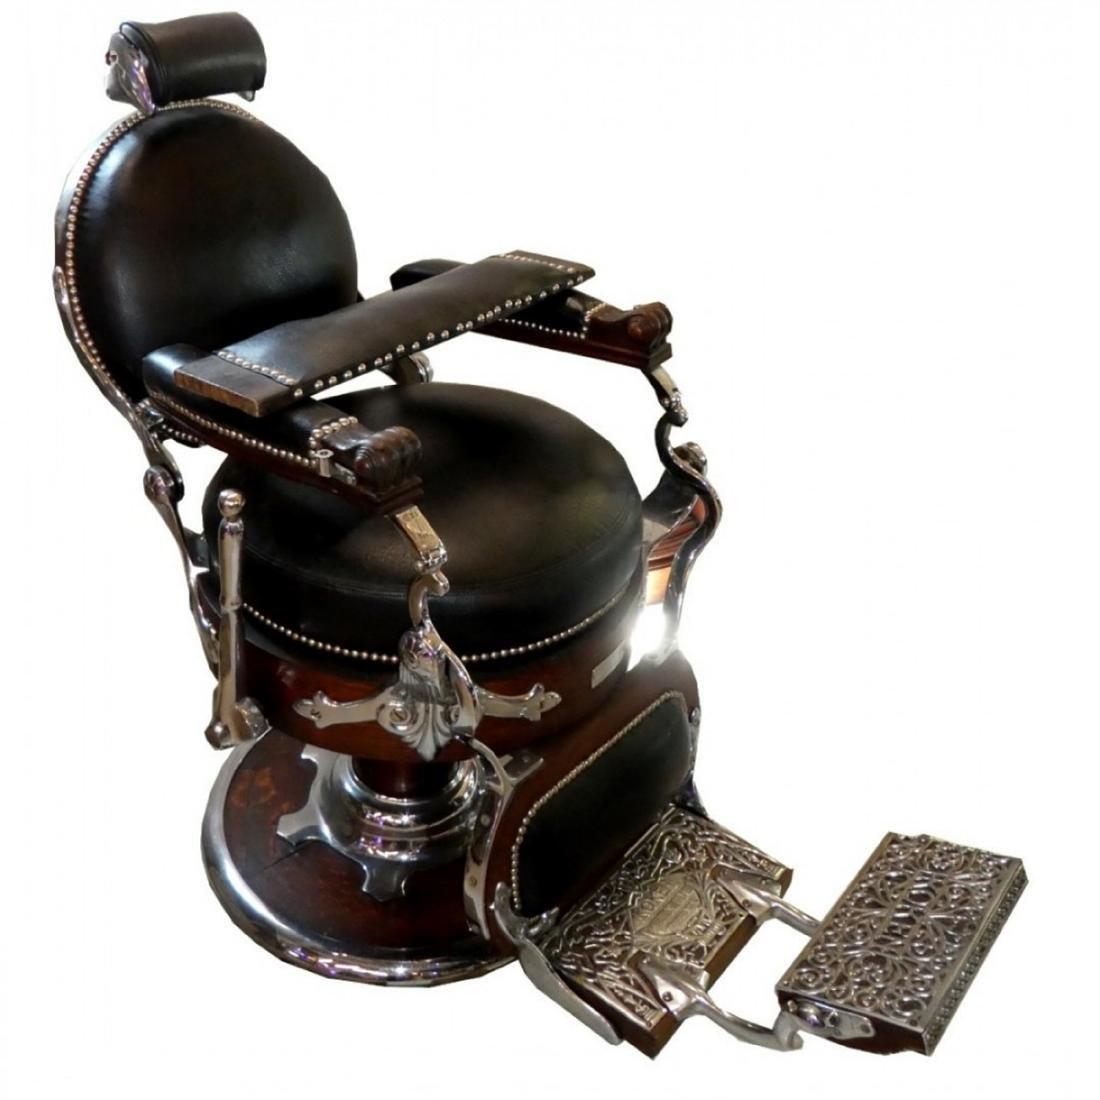 Rare Koken Congress round seat barber chair